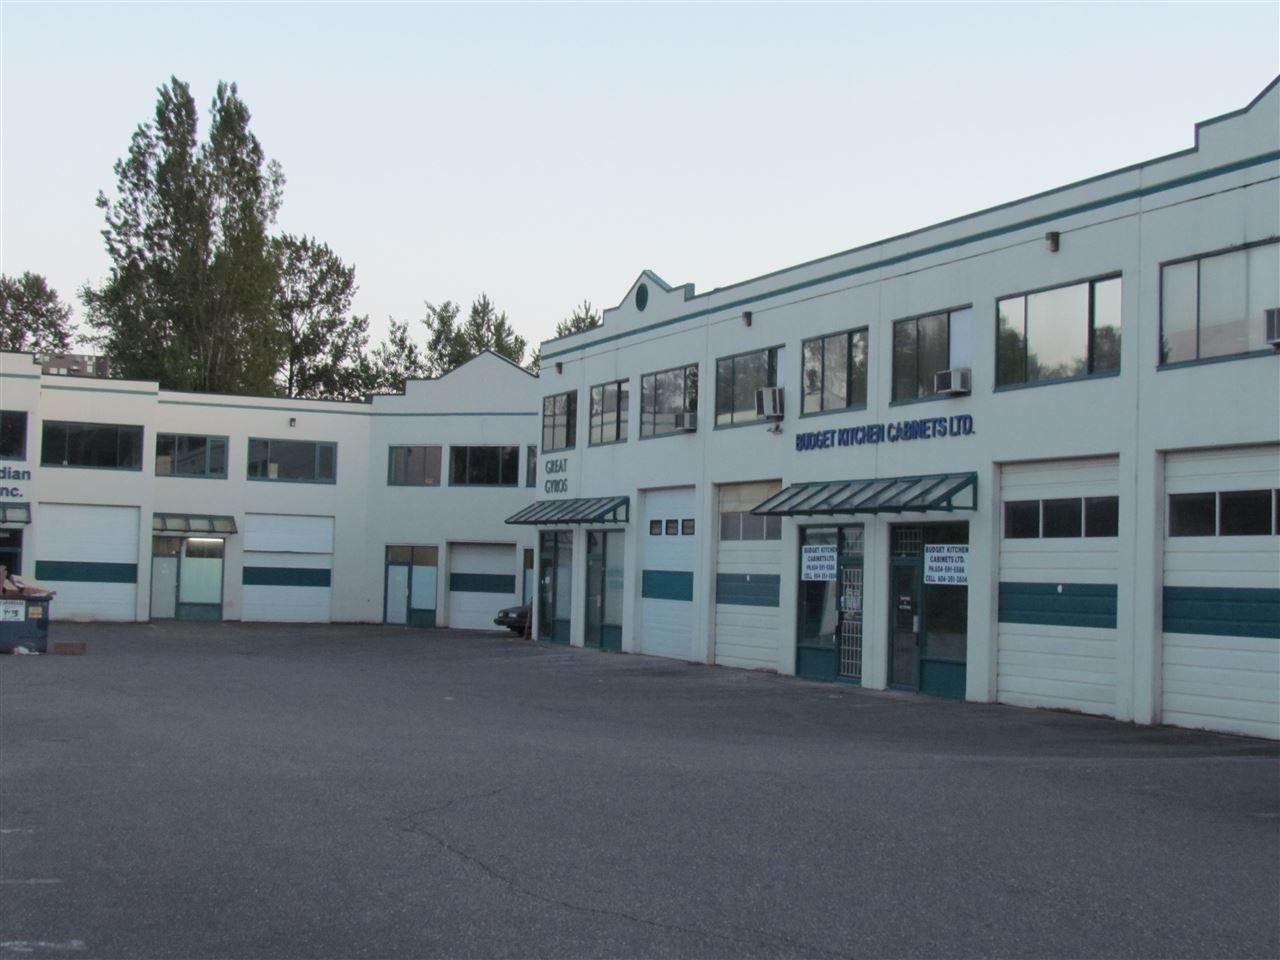 Main Photo: 9 13140 88 Avenue in Surrey: Queen Mary Park Surrey Commercial for sale : MLS®# C8000671